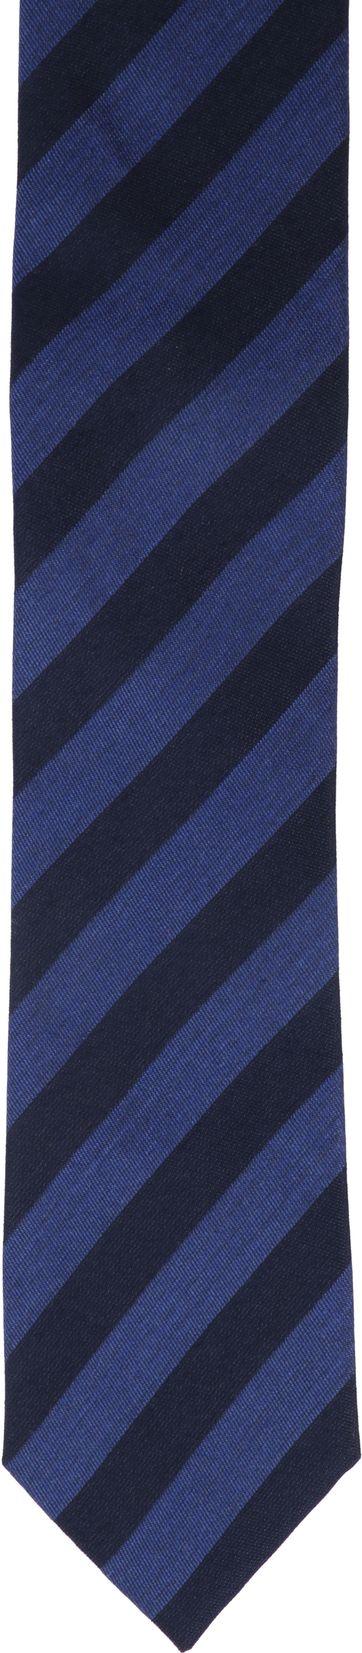 Krawatte Seide Dunkelblau Streifen K82-16